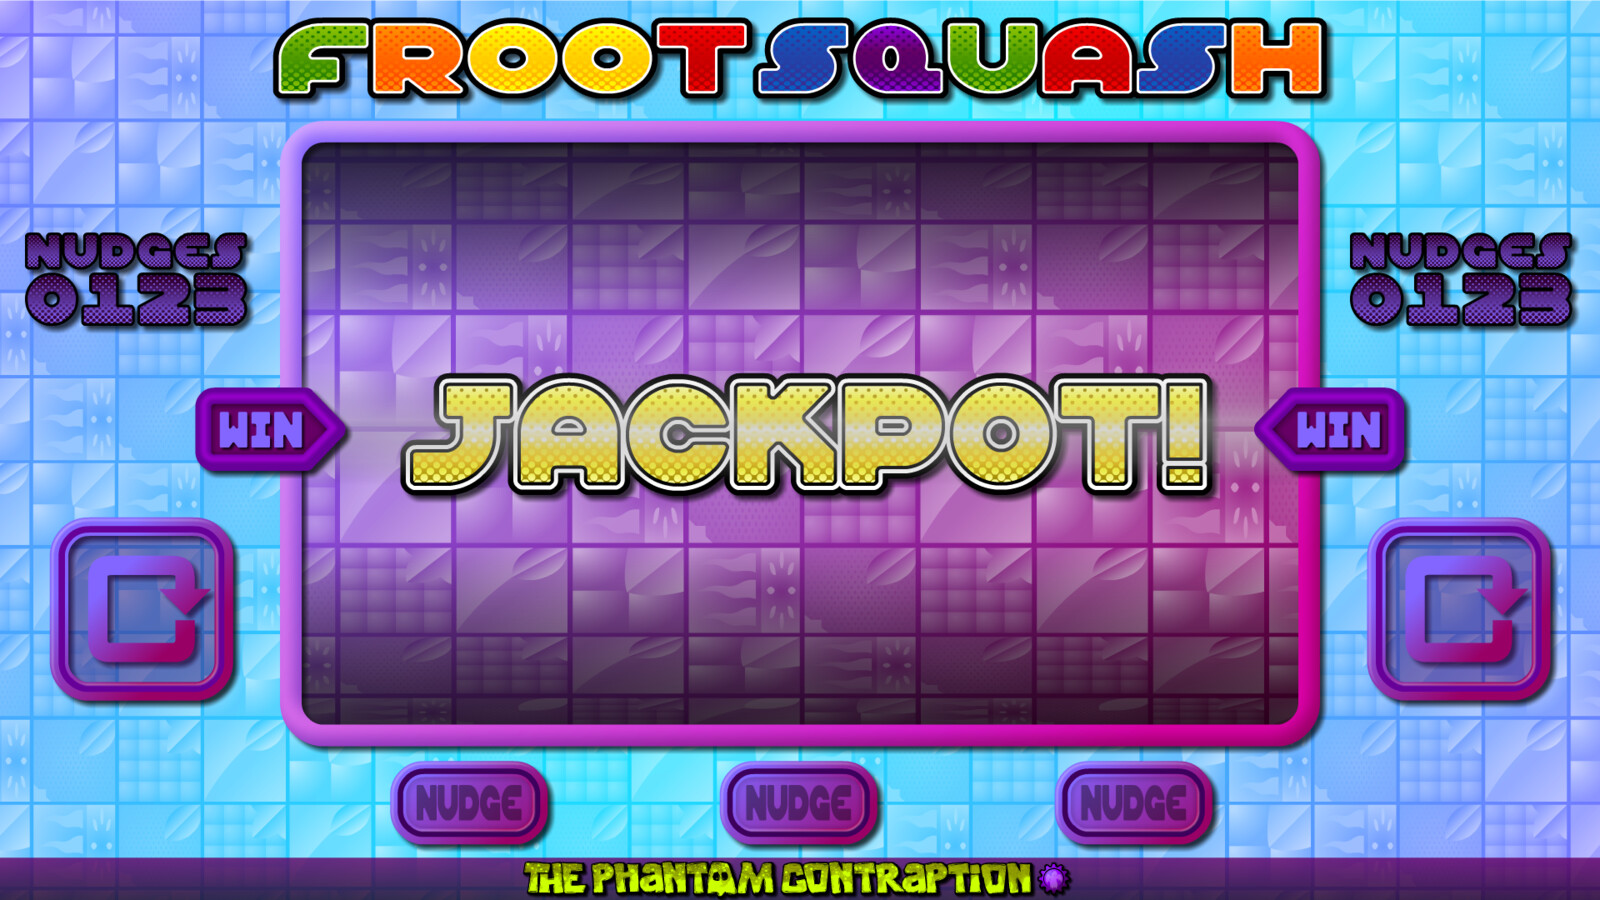 Froot Squash Landscape Screenshot: Jackpot Screen